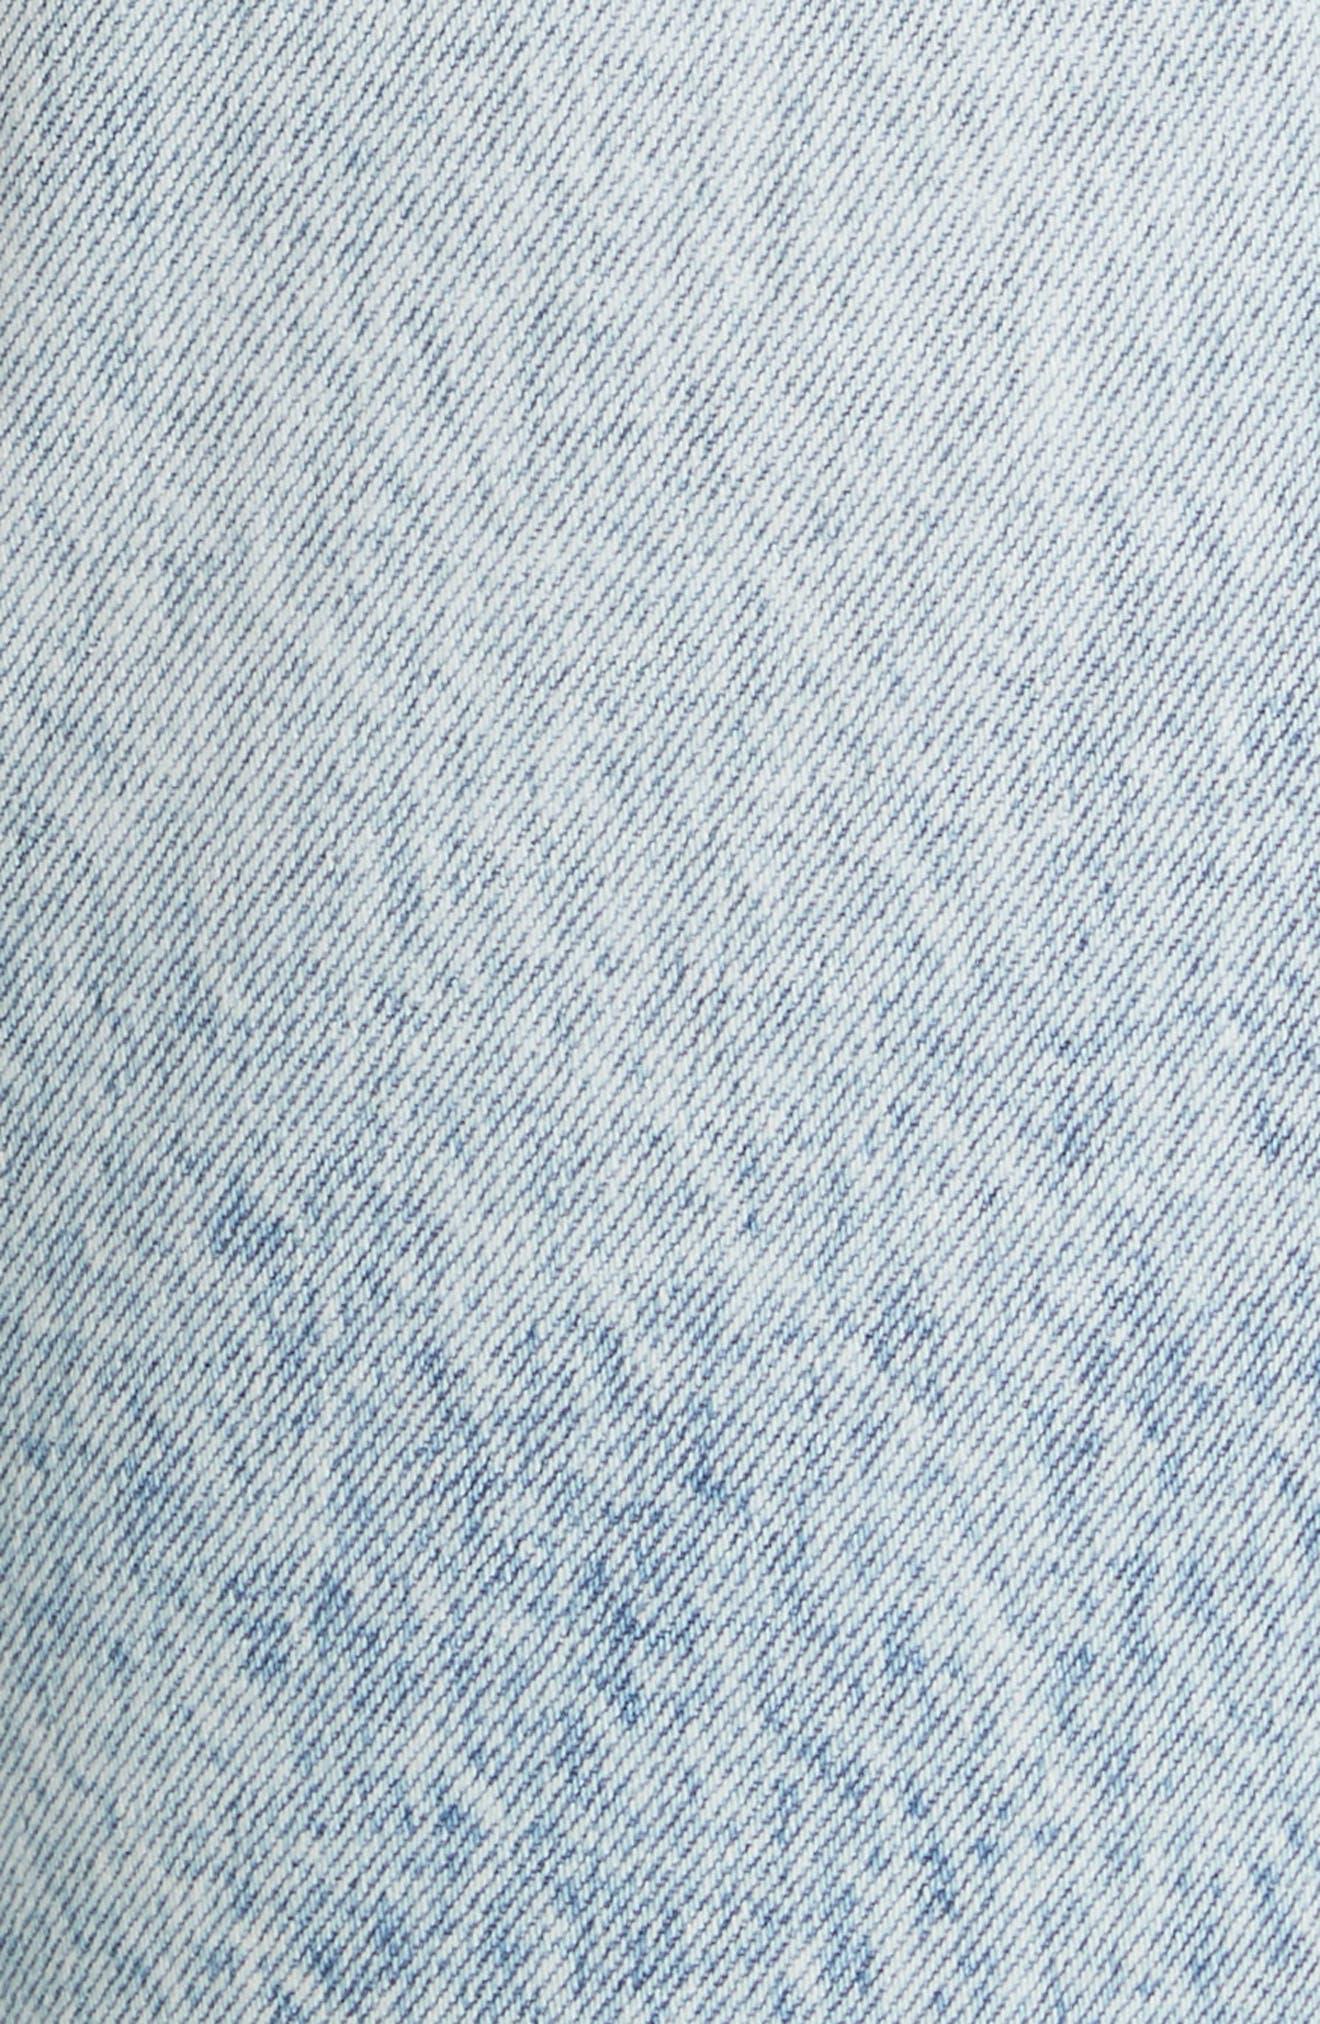 Karolina Ripped Skinny Jeans,                             Alternate thumbnail 5, color,                             487